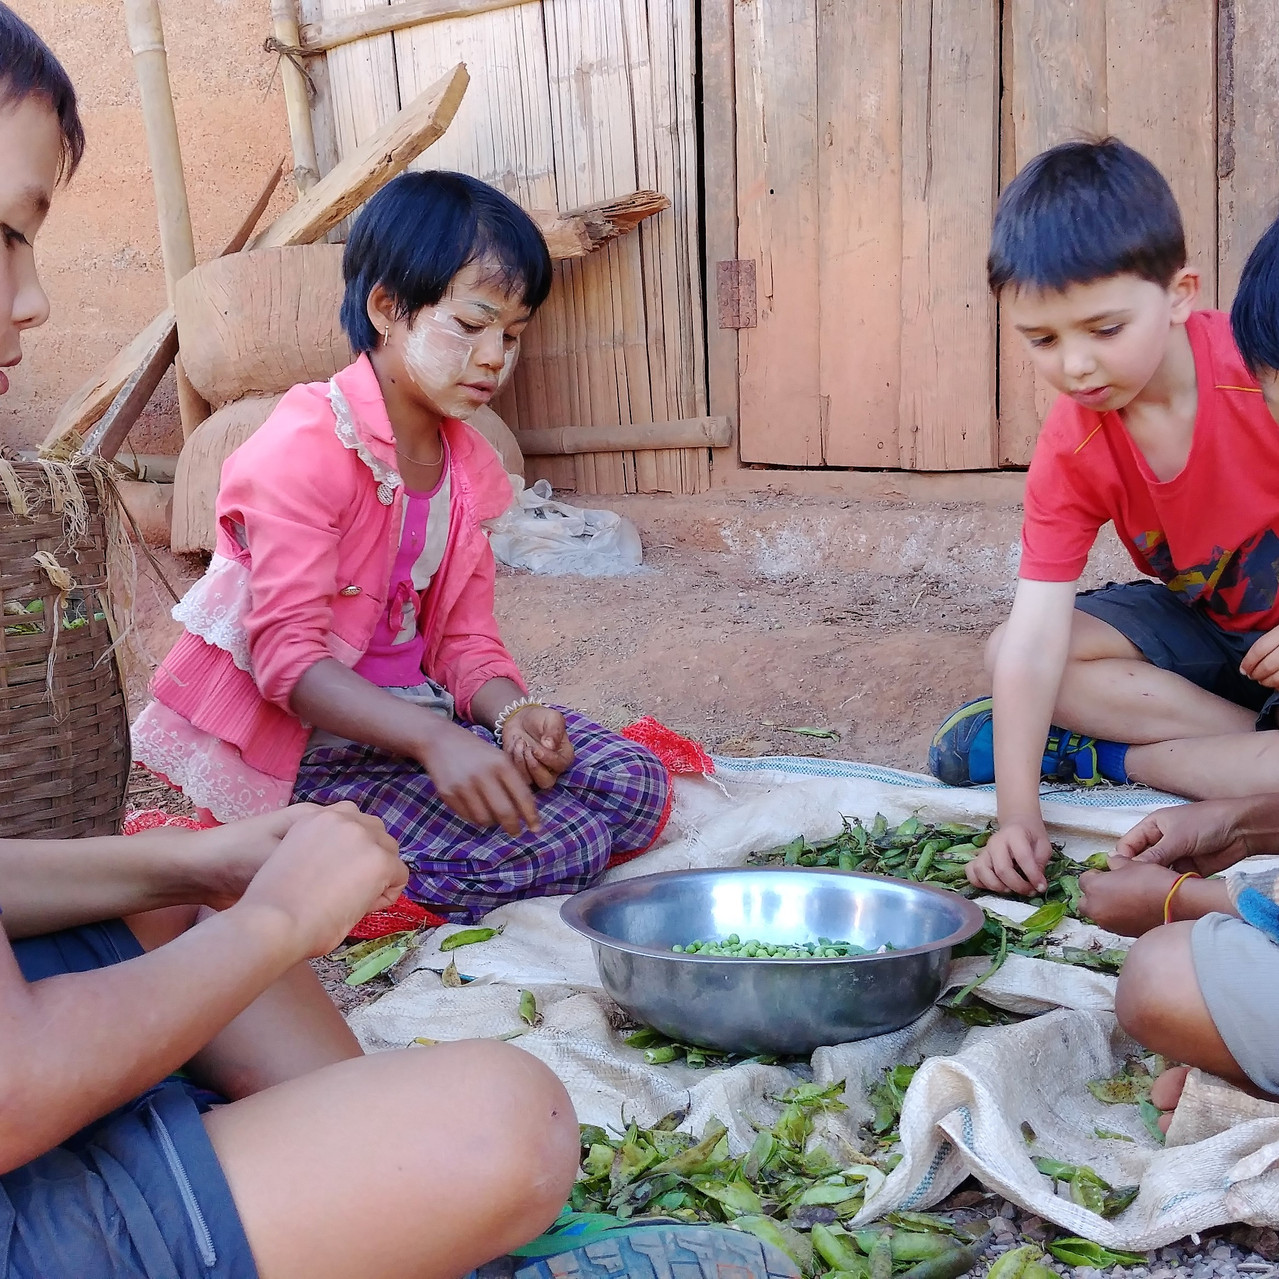 Atelier épluchage des haricots